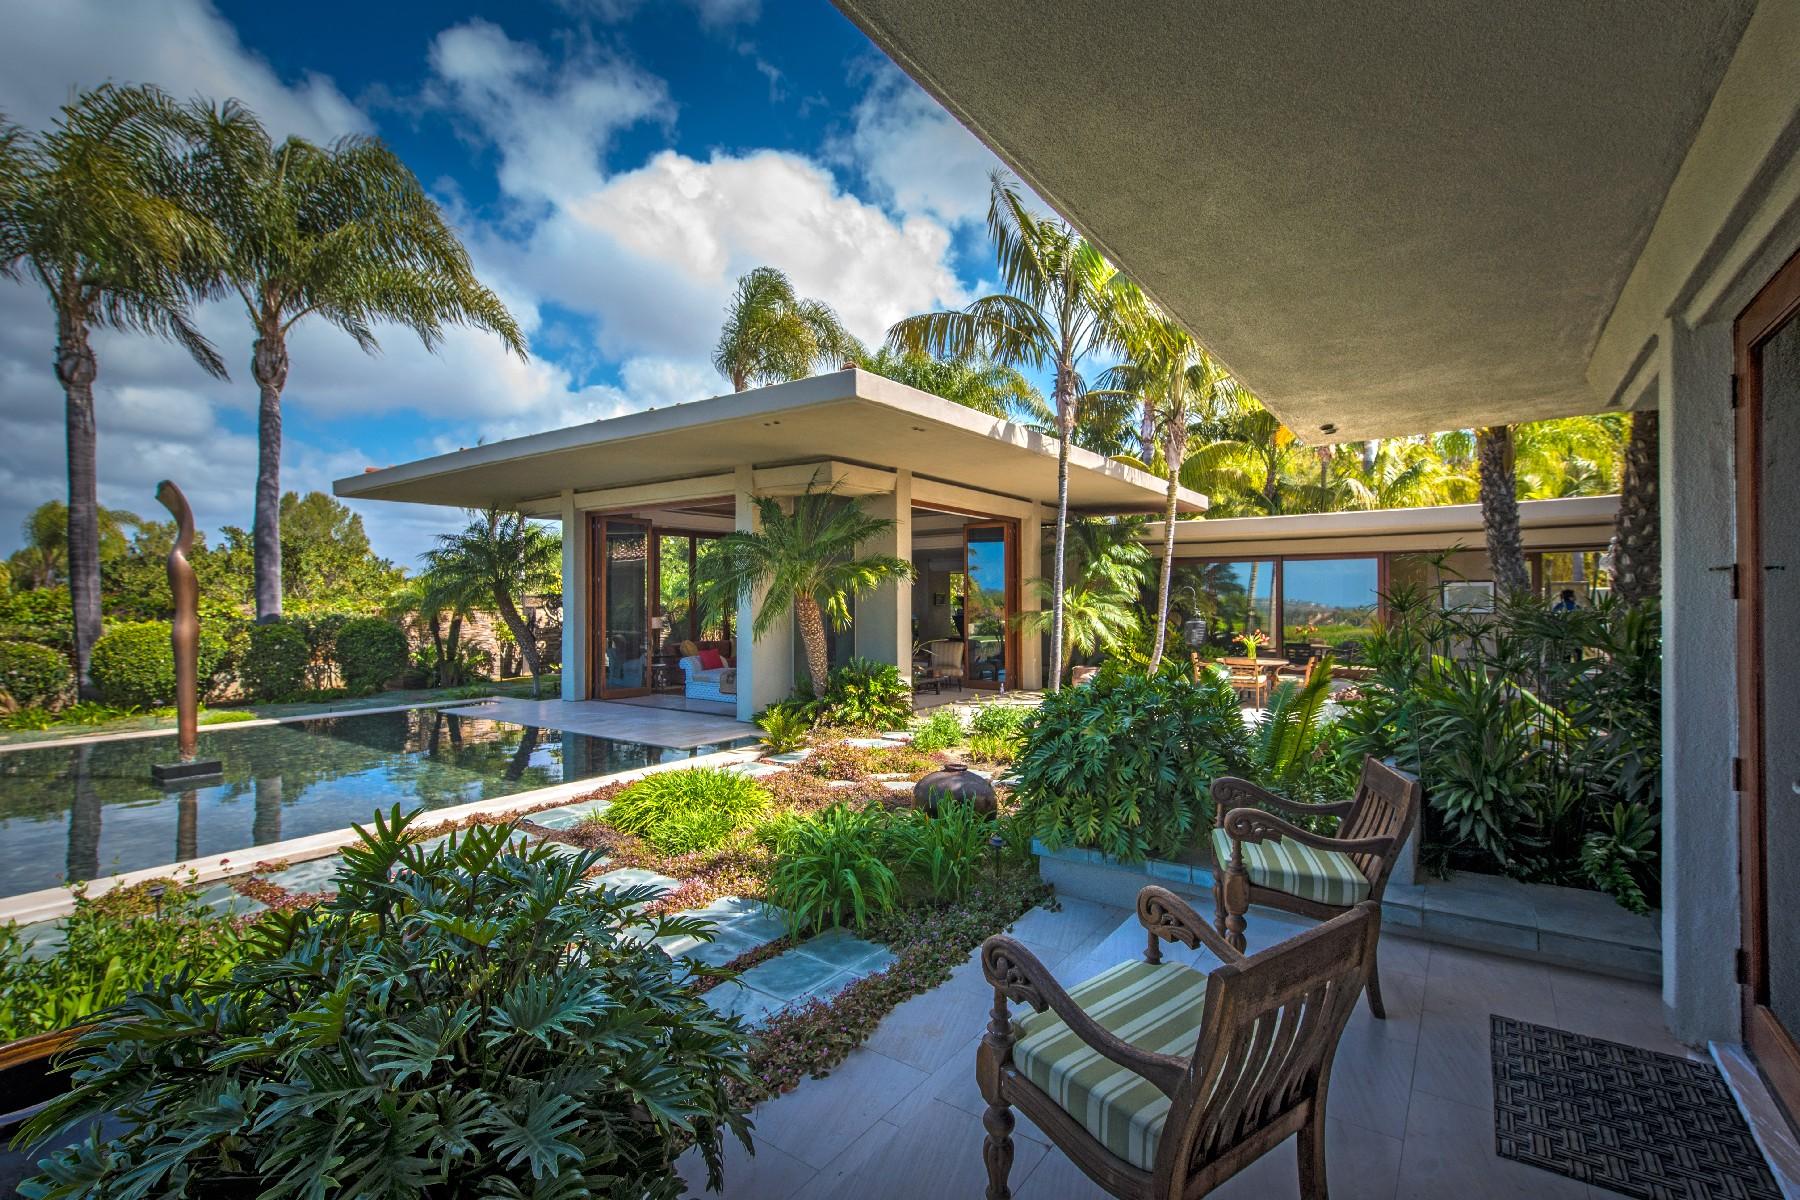 Additional photo for property listing at 5979 Rancho Diegueno  Rancho Santa Fe, Калифорния 92067 Соединенные Штаты